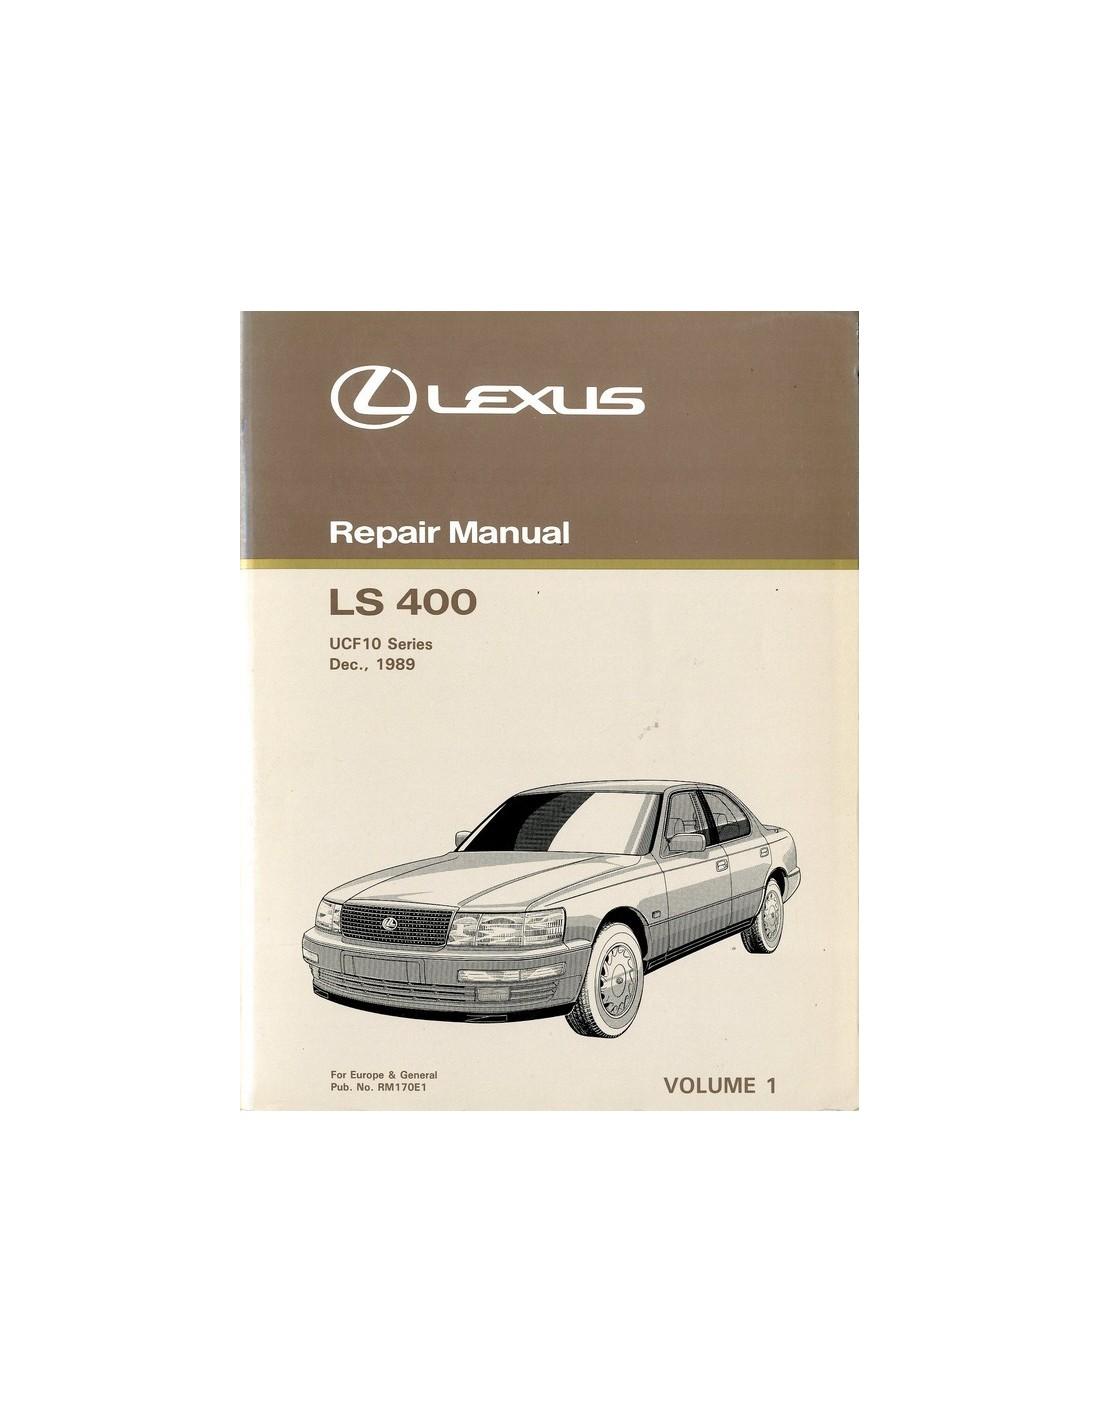 1990 lexus ls 400 chassis body repair manual english rh autolit eu ls400 manual pdf lexus rx 400h manual